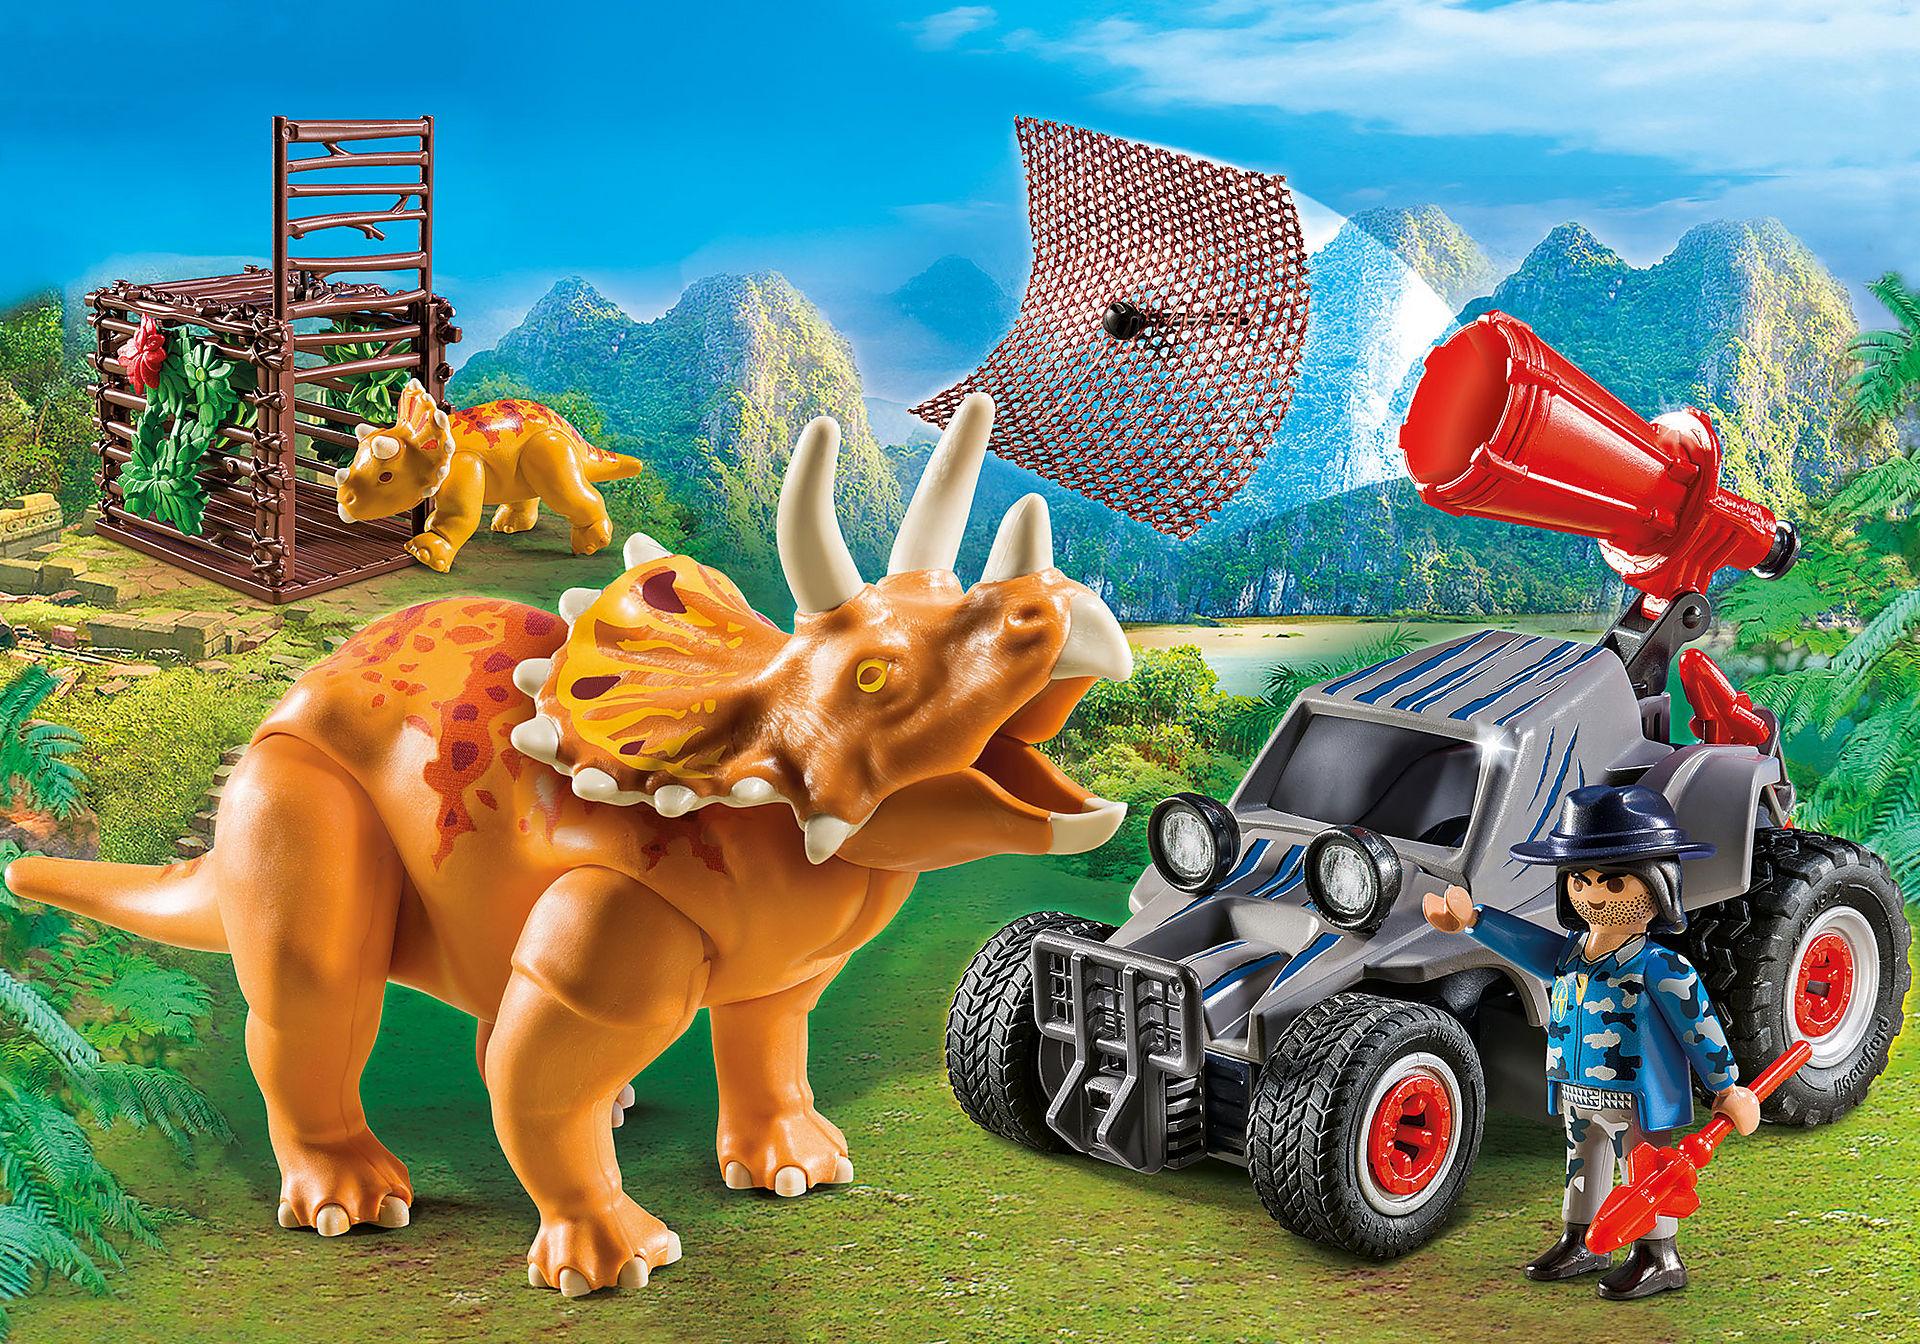 http://media.playmobil.com/i/playmobil/9434_product_detail/Όχημα λαθροκυνηγών και οικογένεια Τρικεράτωψ